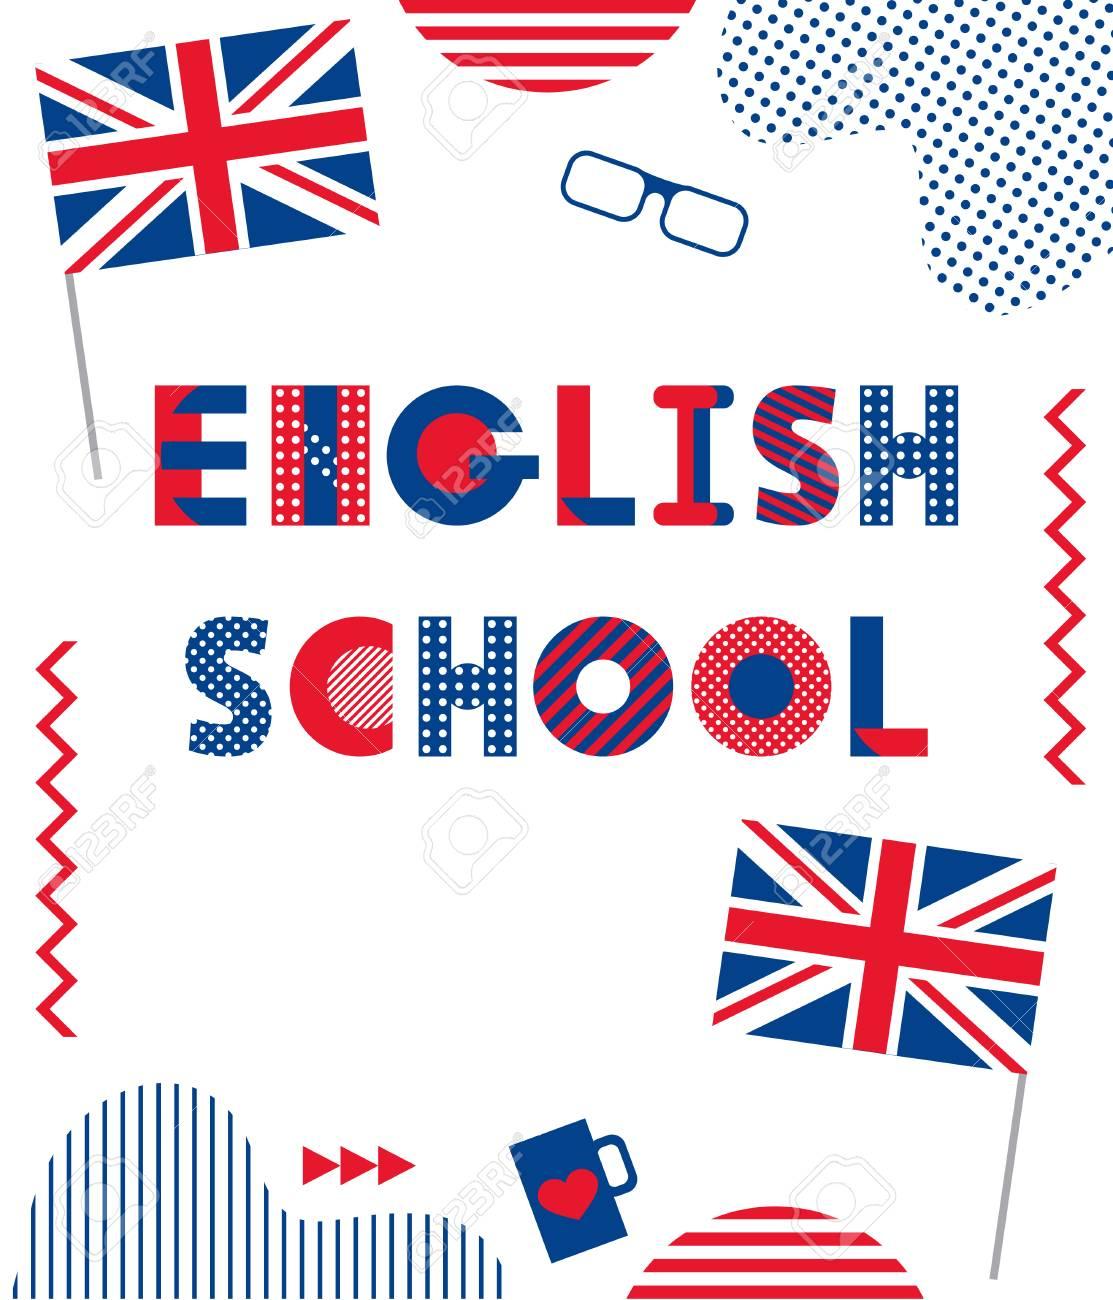 English School Trendy Geometric Font Text And Geometric Elements